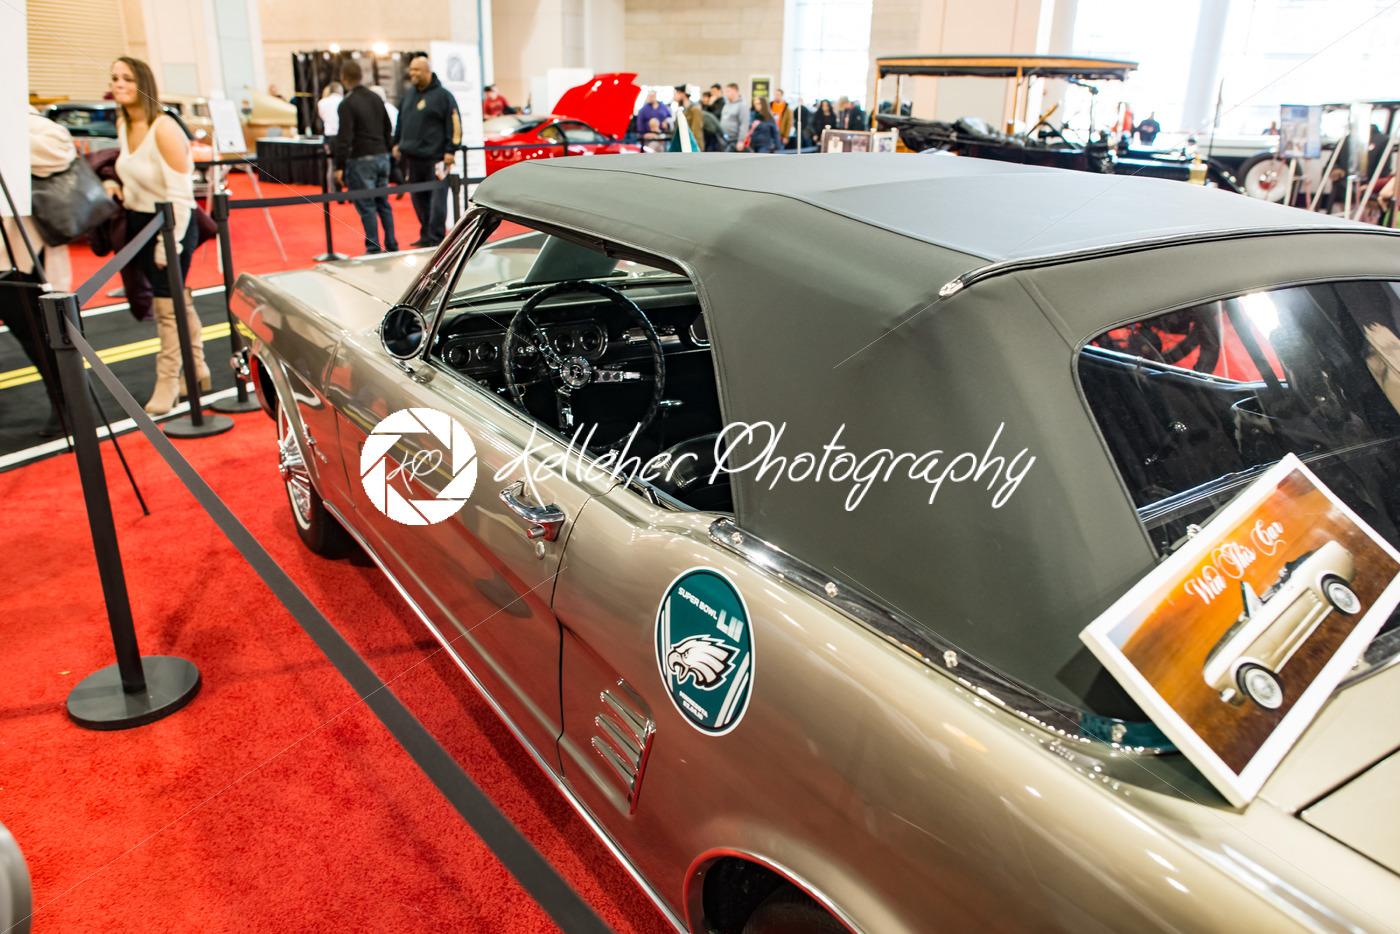 PHILADELPHIA, PA – Feb 3: 1967 Ford Mustang at the 2018 Philadelphia Auto Show - Kelleher Photography Store